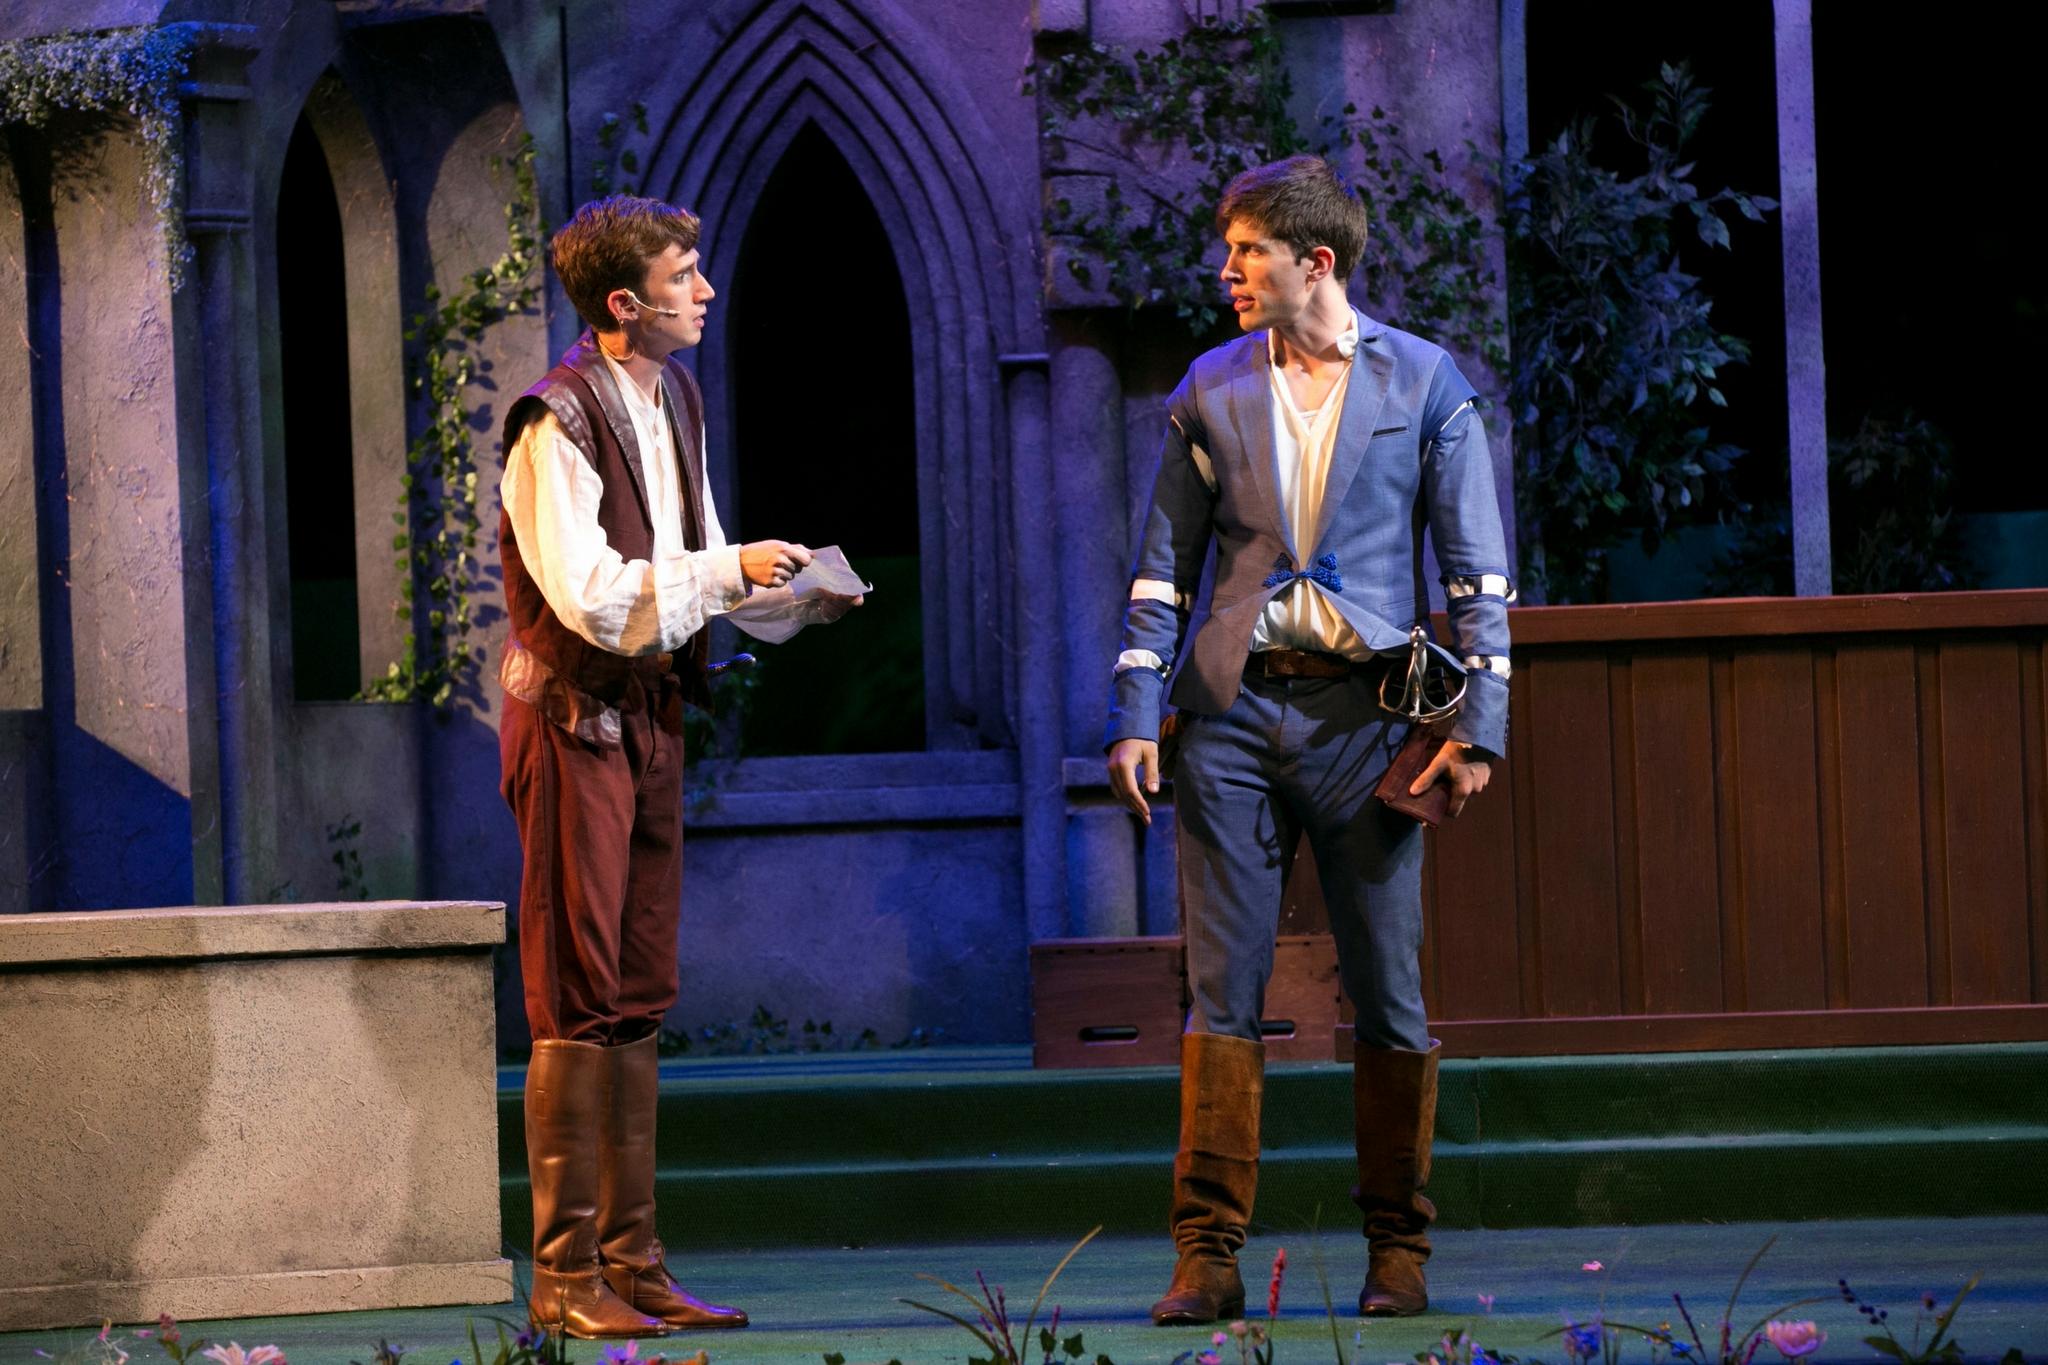 Keith Hale and John Zdrojeski in Romeo & Juliet, Shakespeare on the Common 2017-Photo by Evgenia Eliseeva